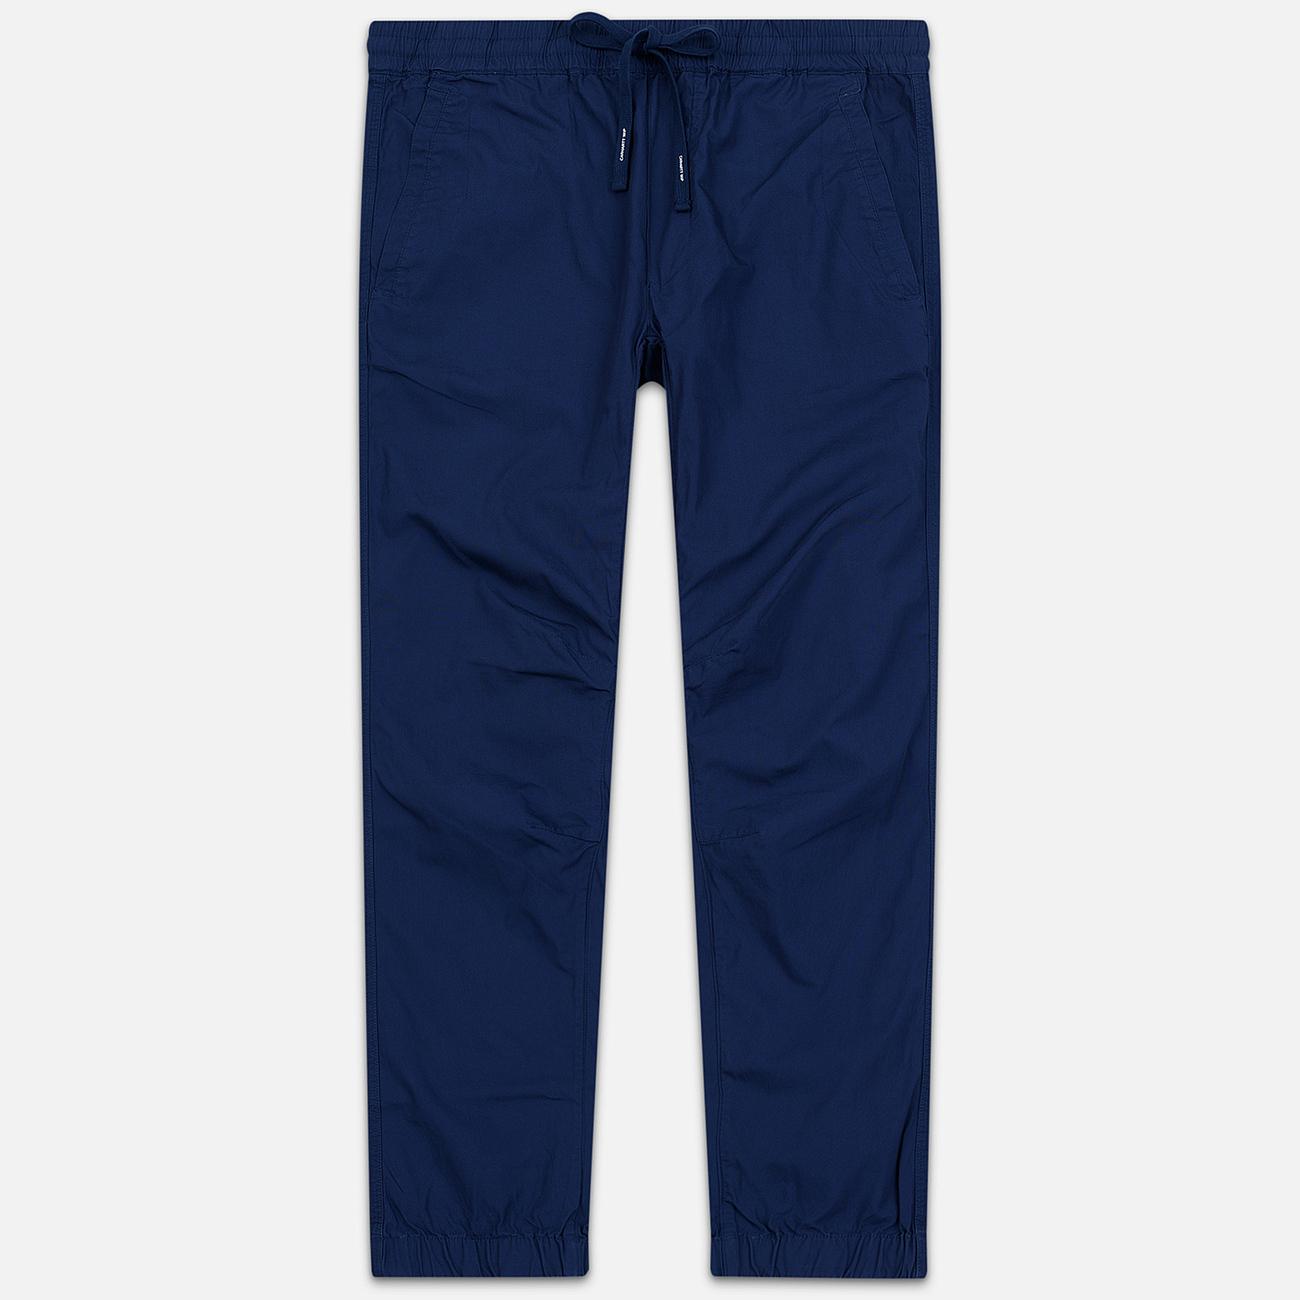 Мужские брюки Carhartt WIP Coleman 4.4 Oz Metro Blue/Wax